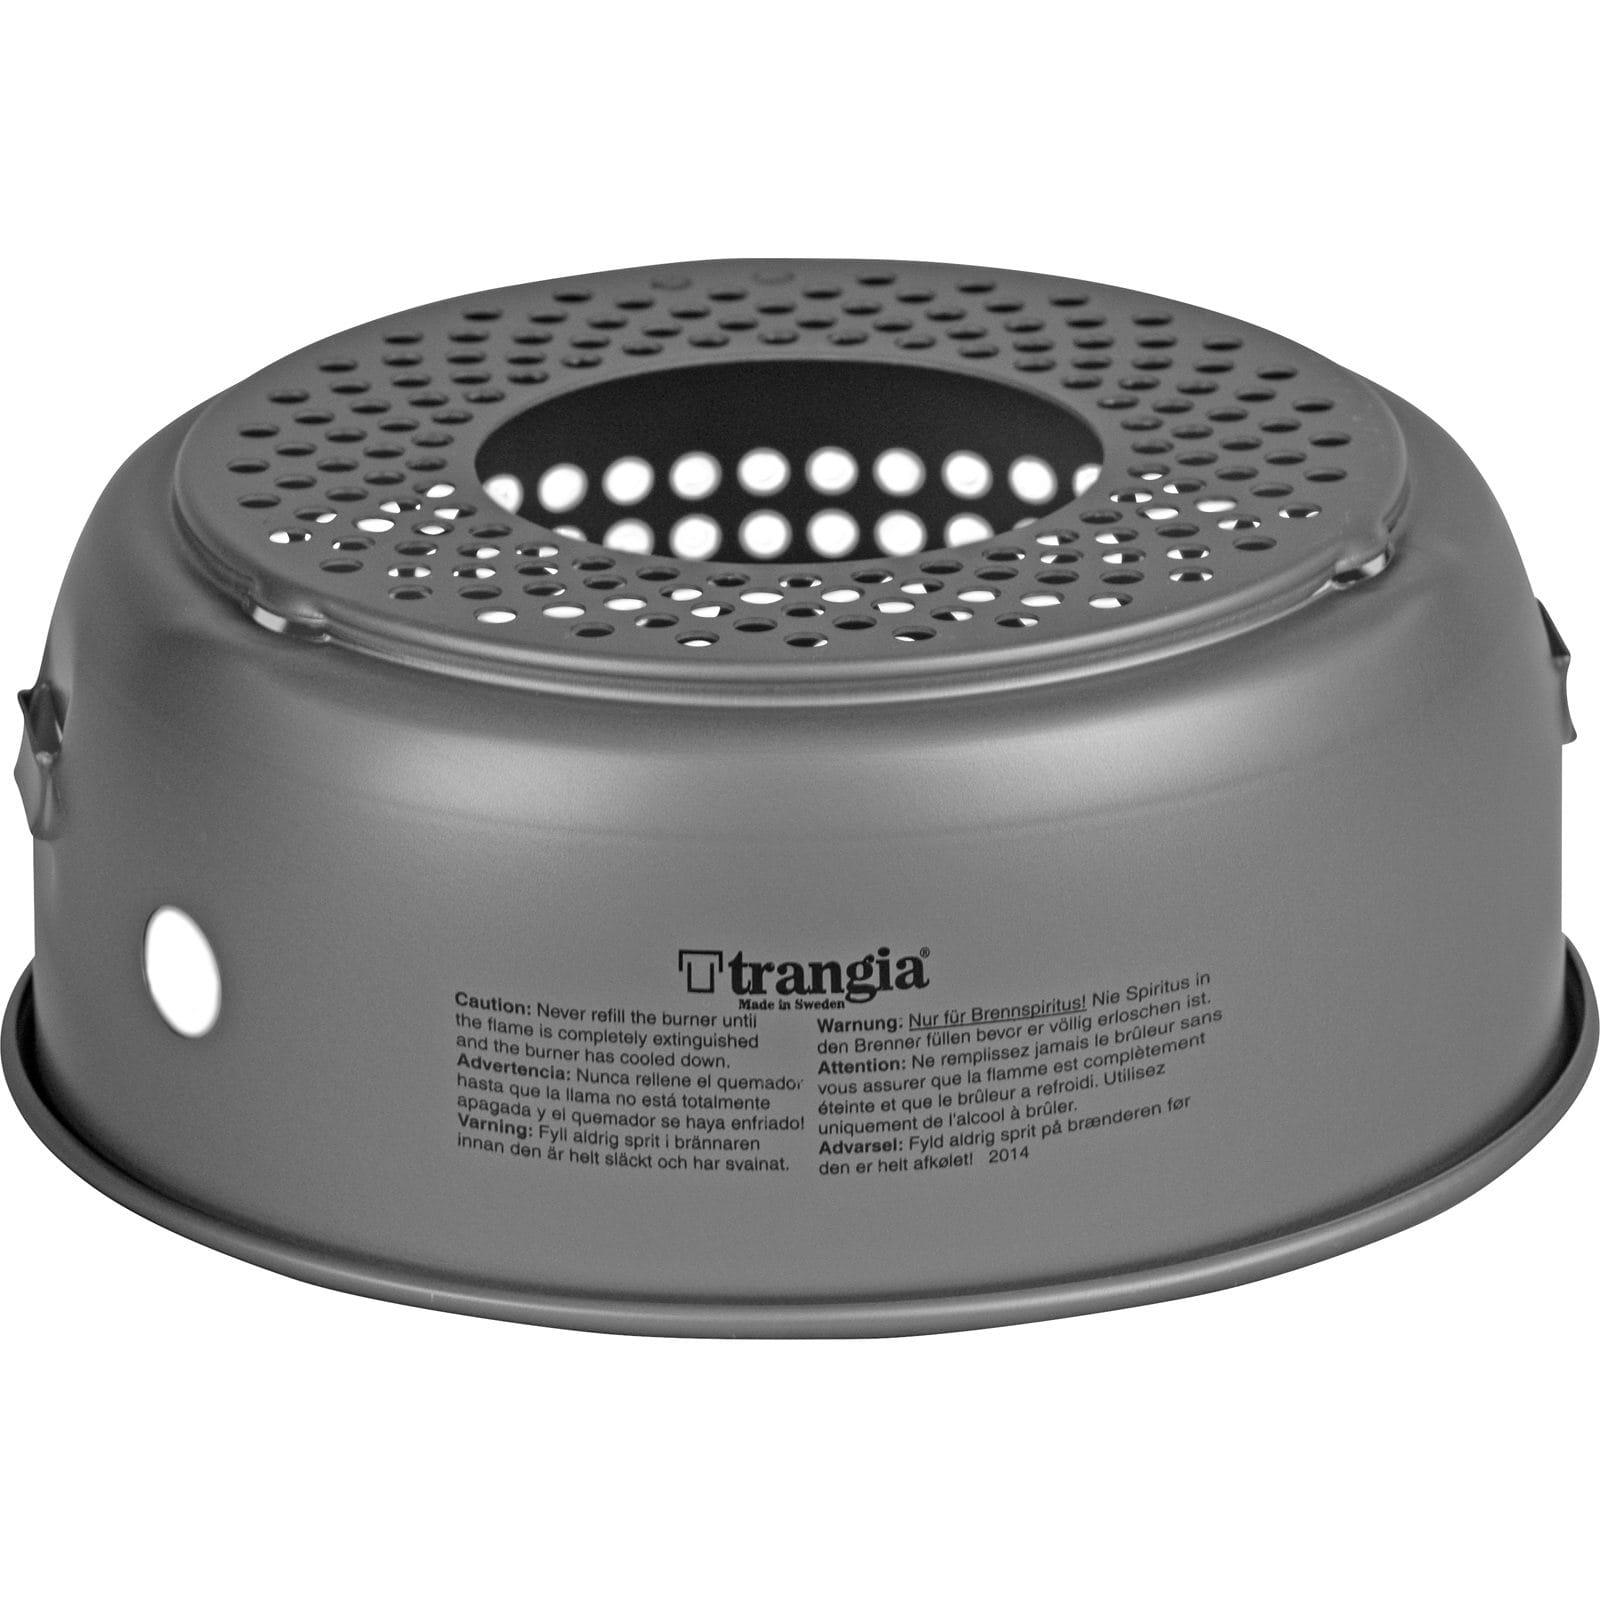 Trangia Windschutz HA ALU unten für Trangia Serie 27 - Bild 1